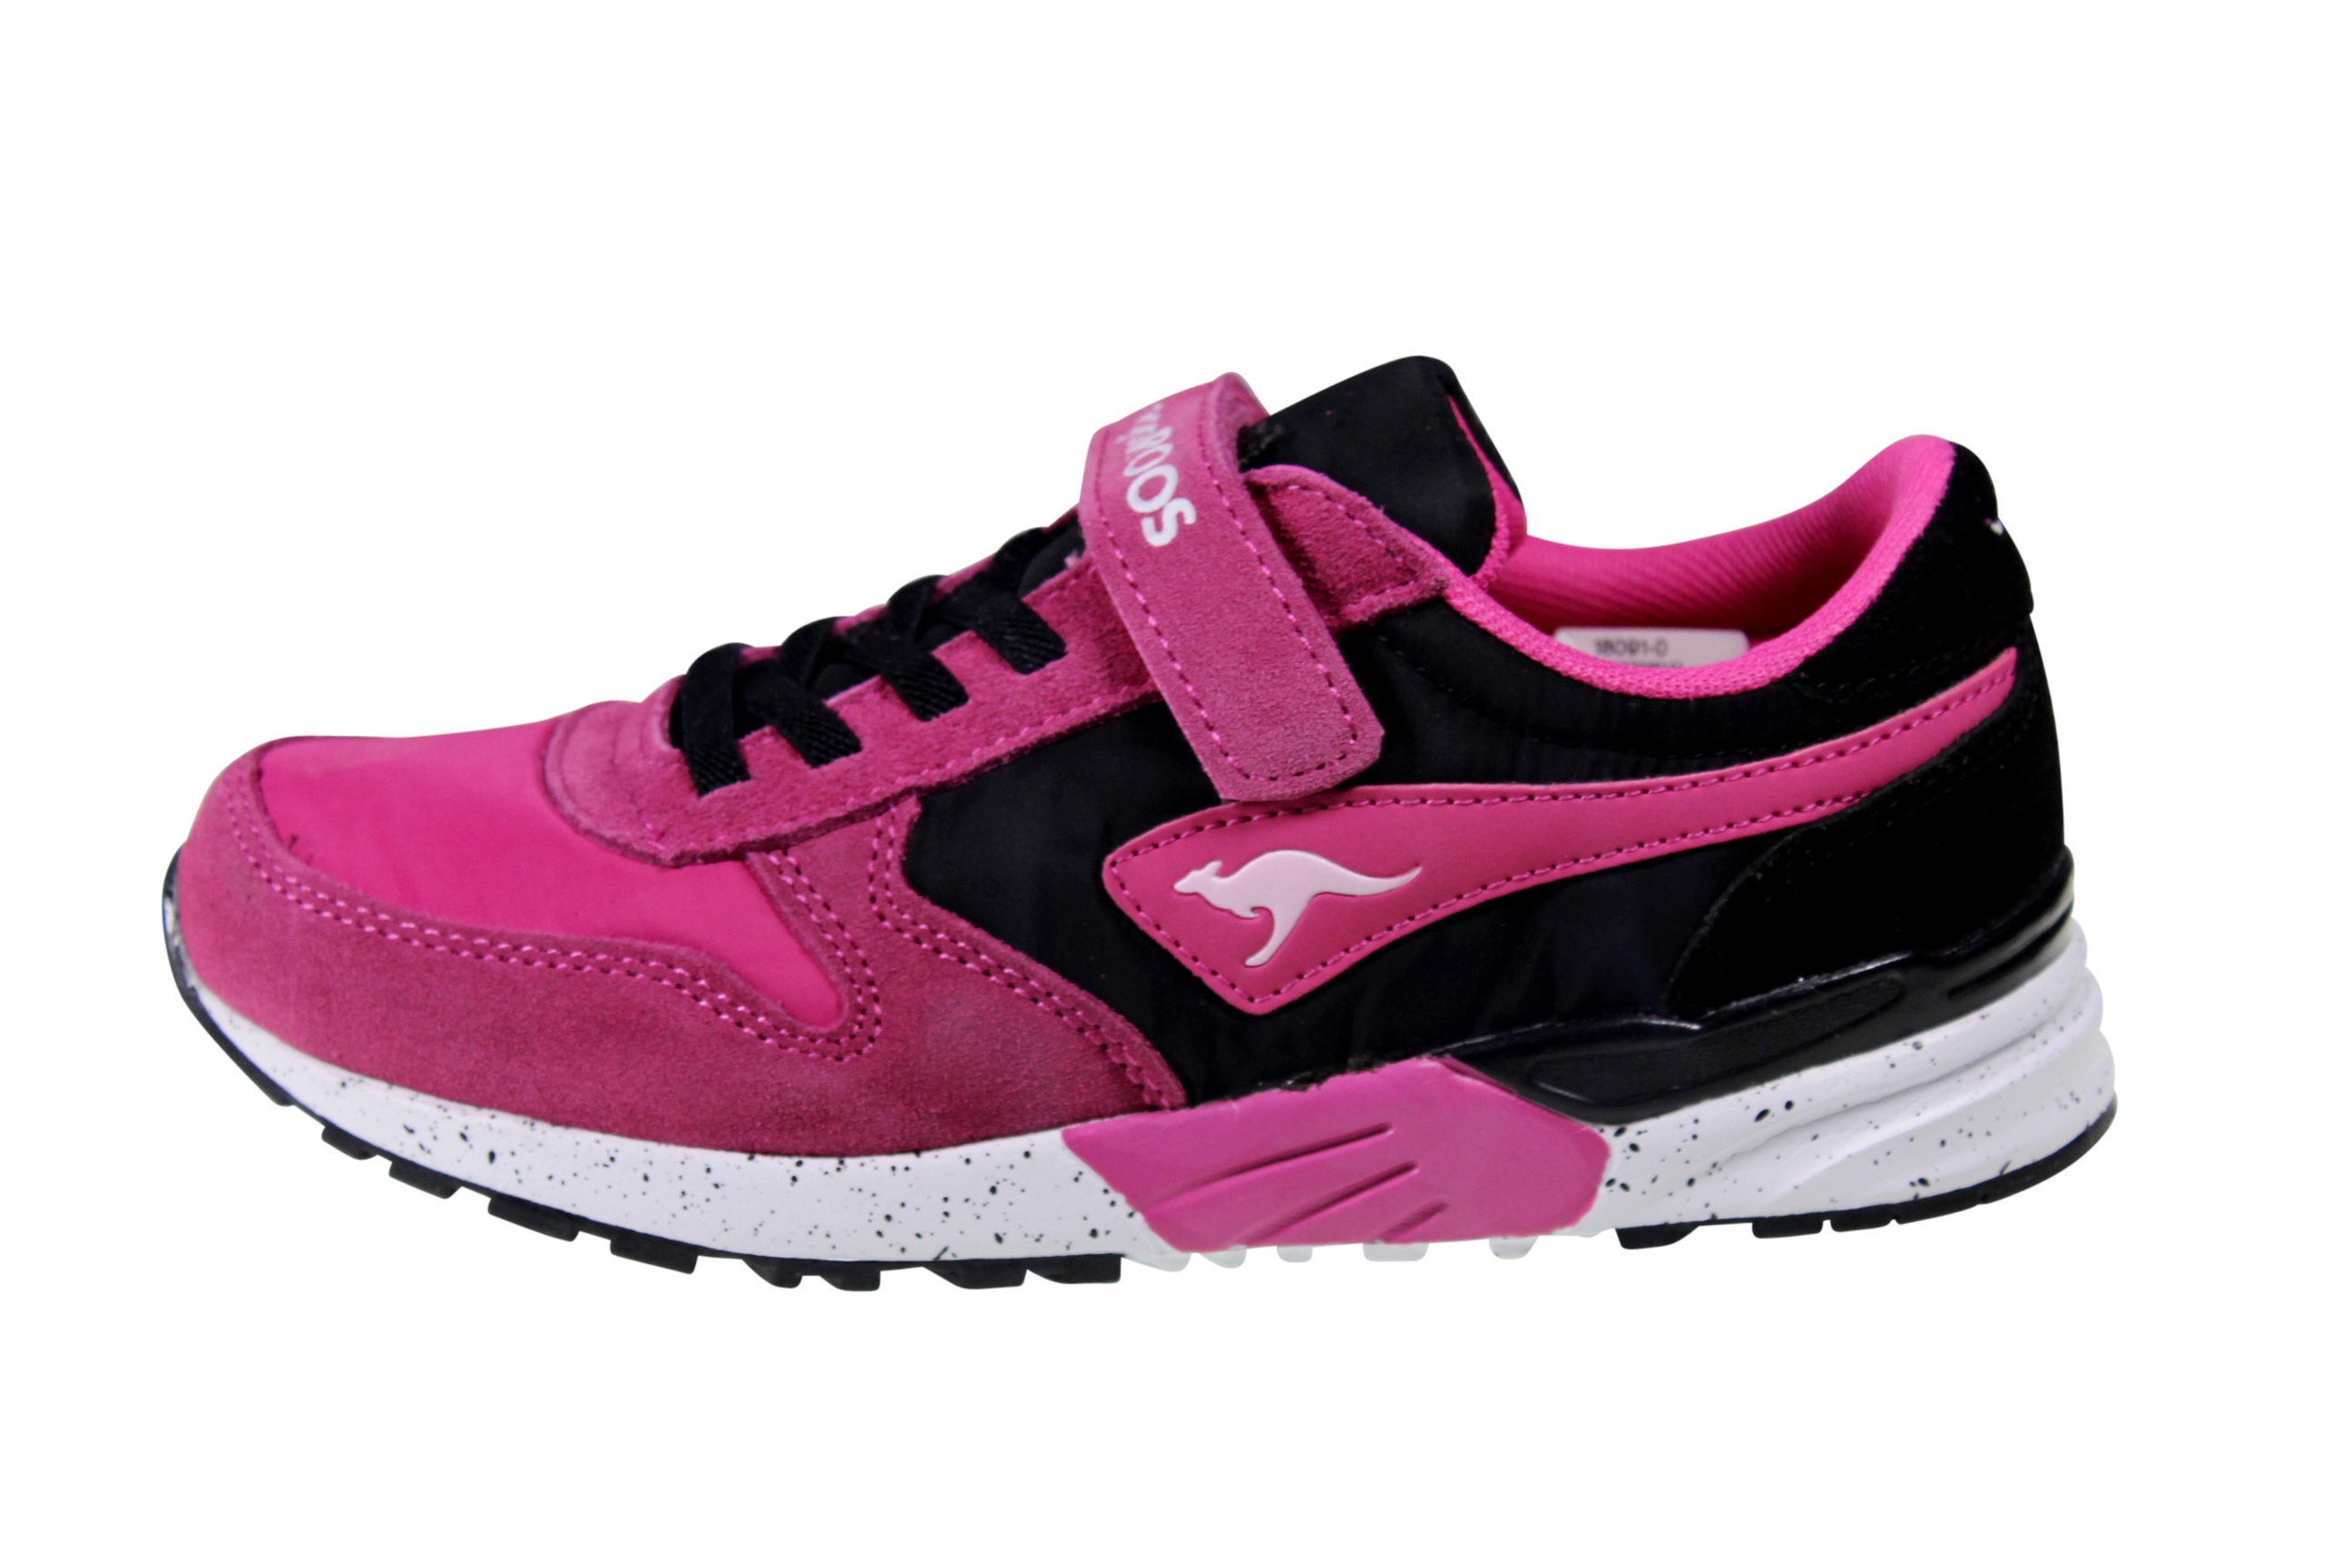 NEU KangaROOS Chinu EV Mädchen Schuhe EUR 39 Sneaker